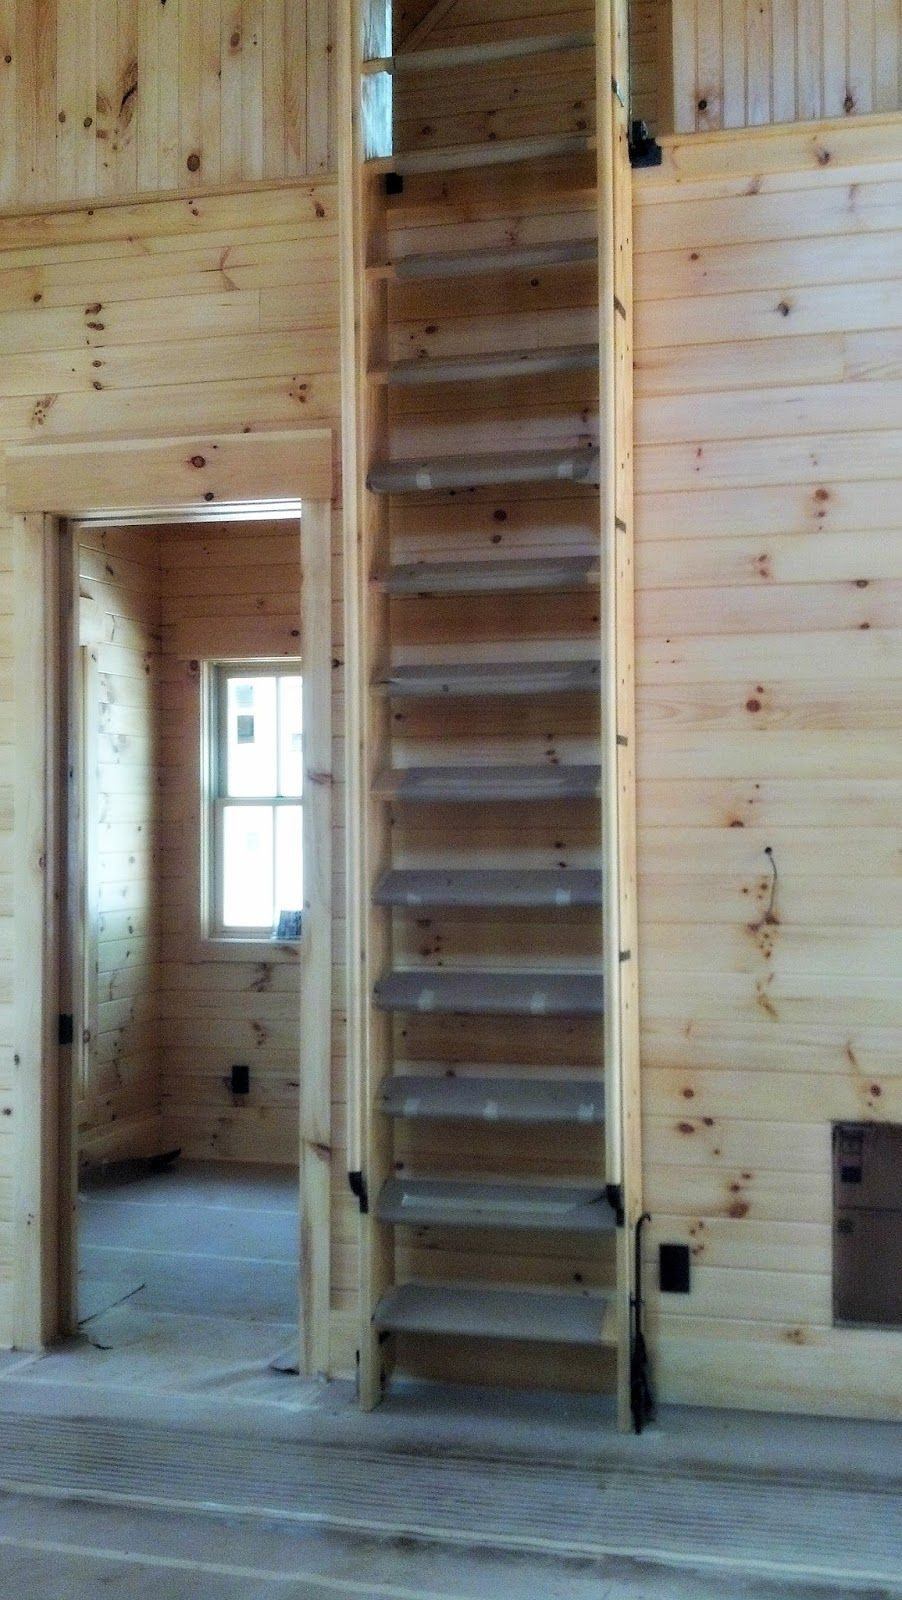 Retracting Ship S Ladder In 2019 Ship Ladder Loft